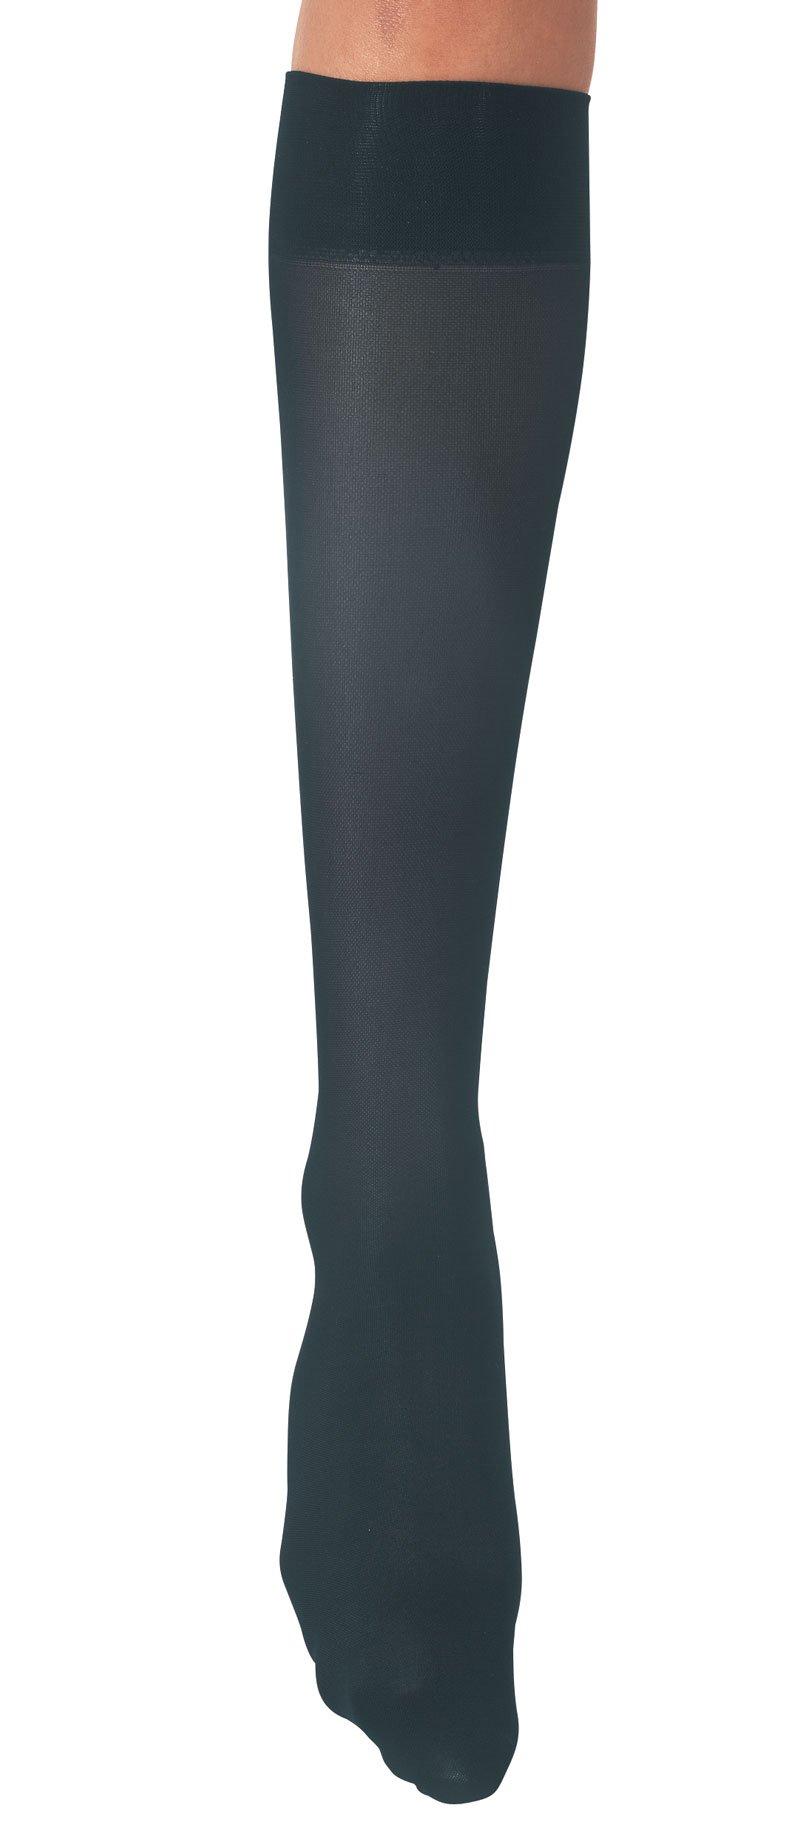 EasyComforts Celeste Stein Compression Socks, 8-15 mmHg